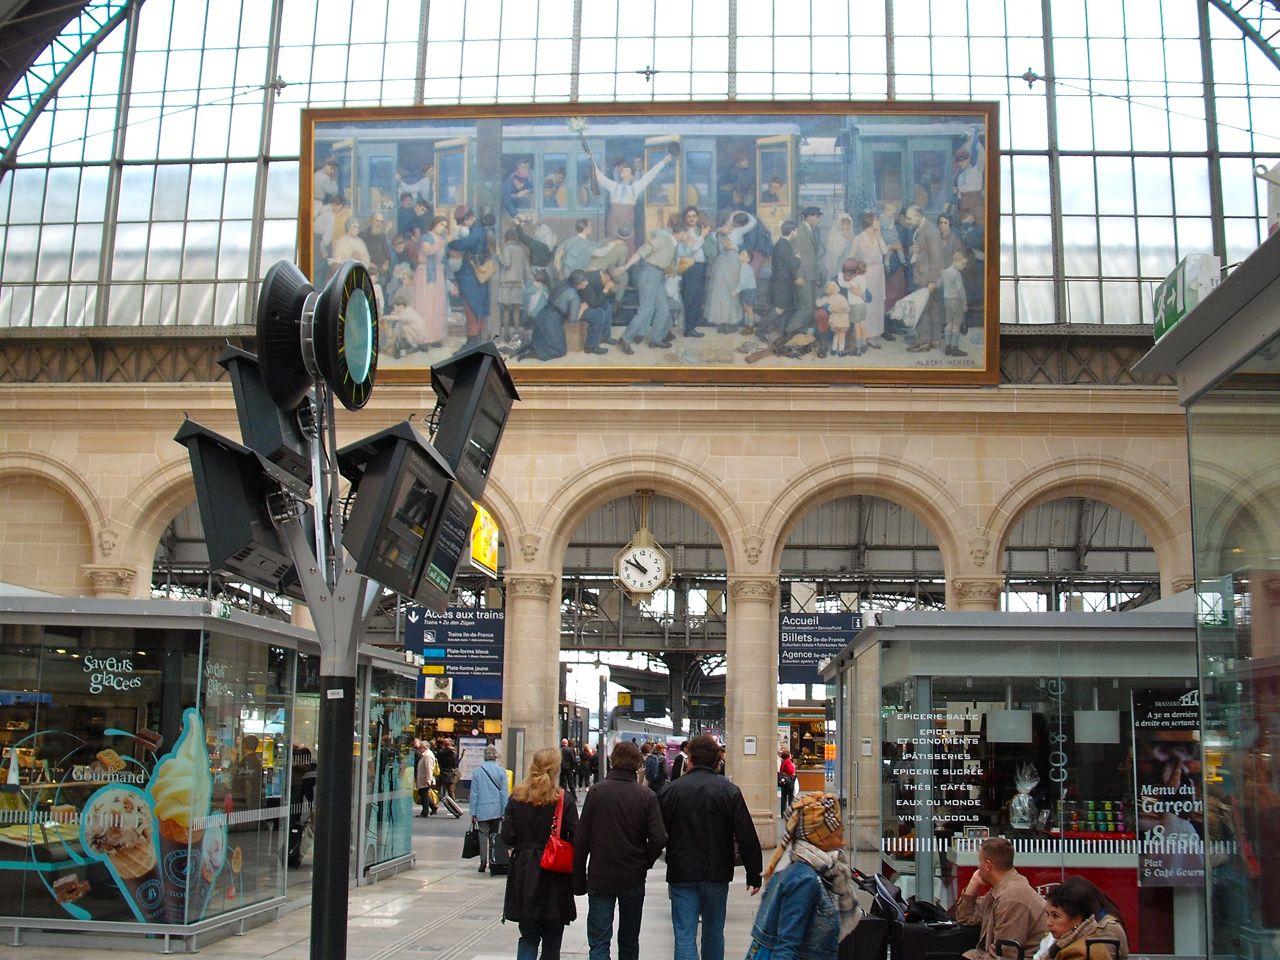 In Gare de L'Est